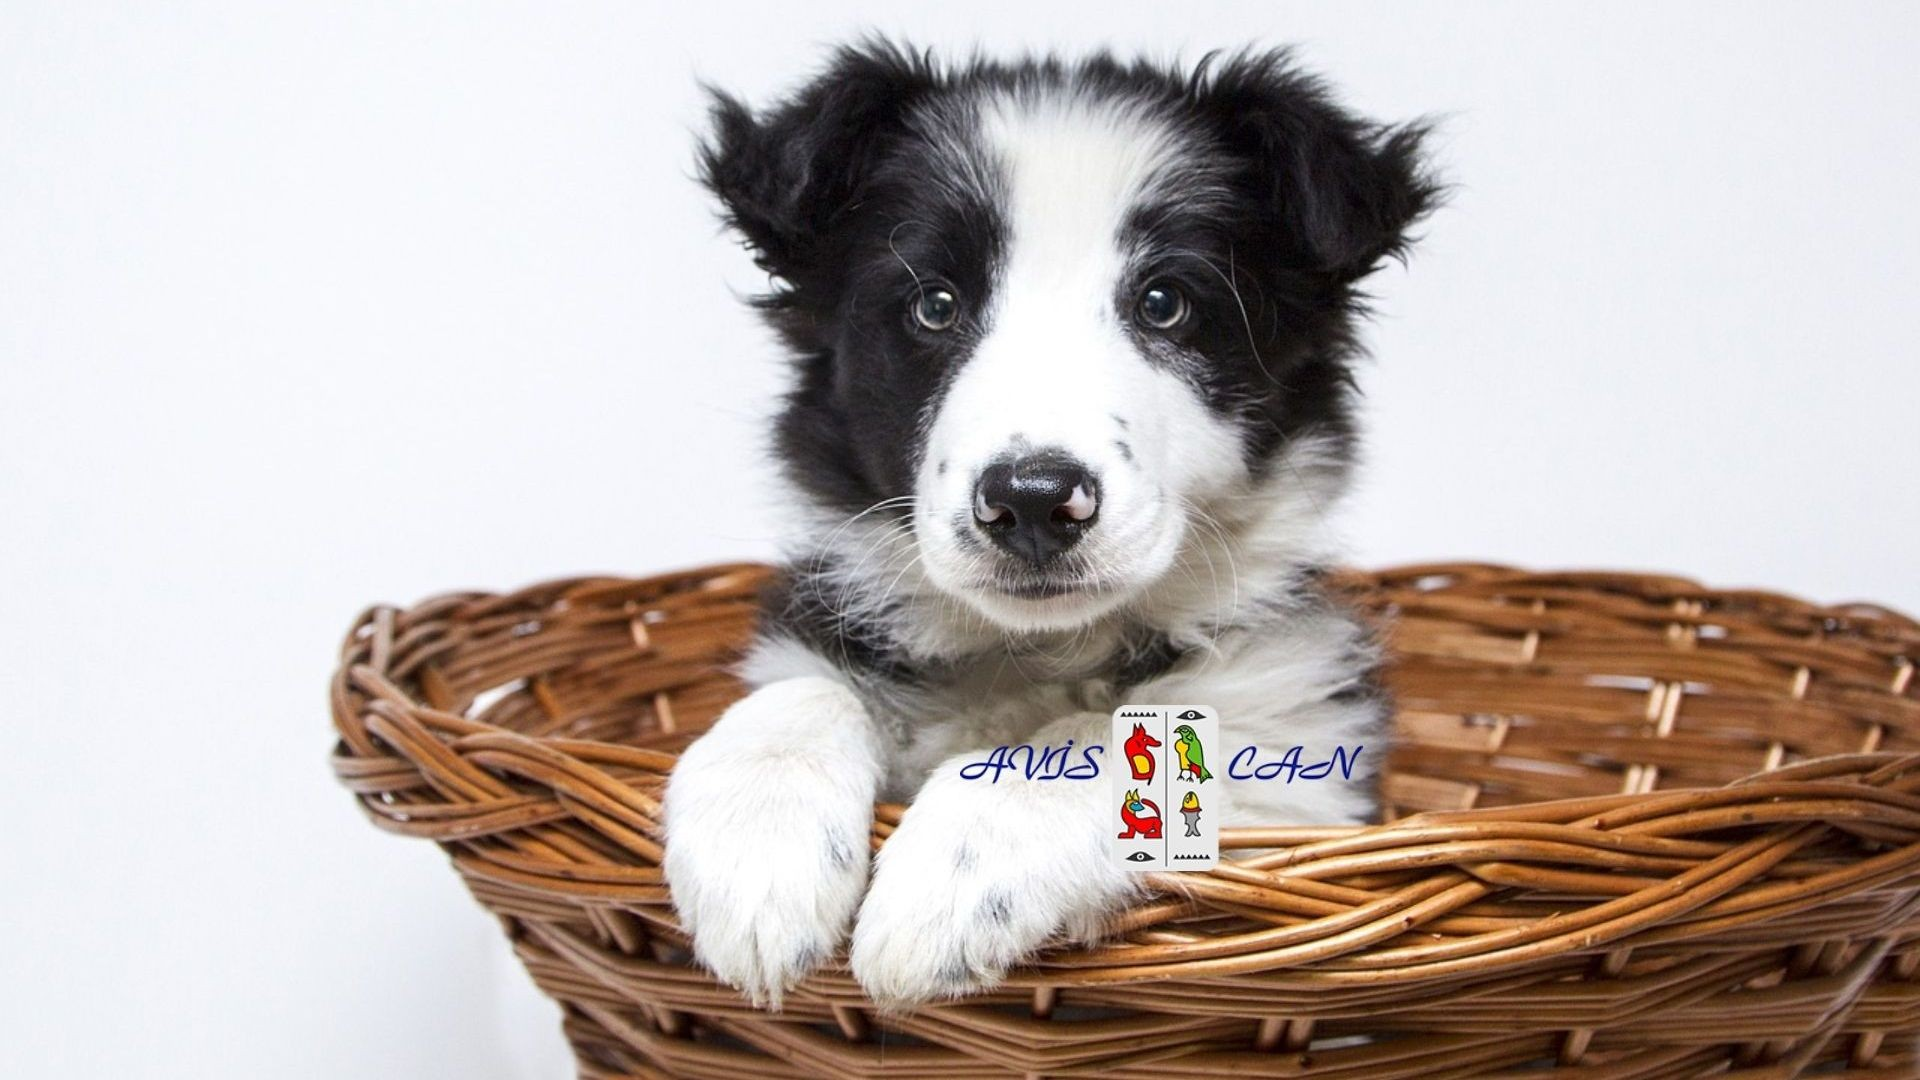 consulta veterinaria (1)